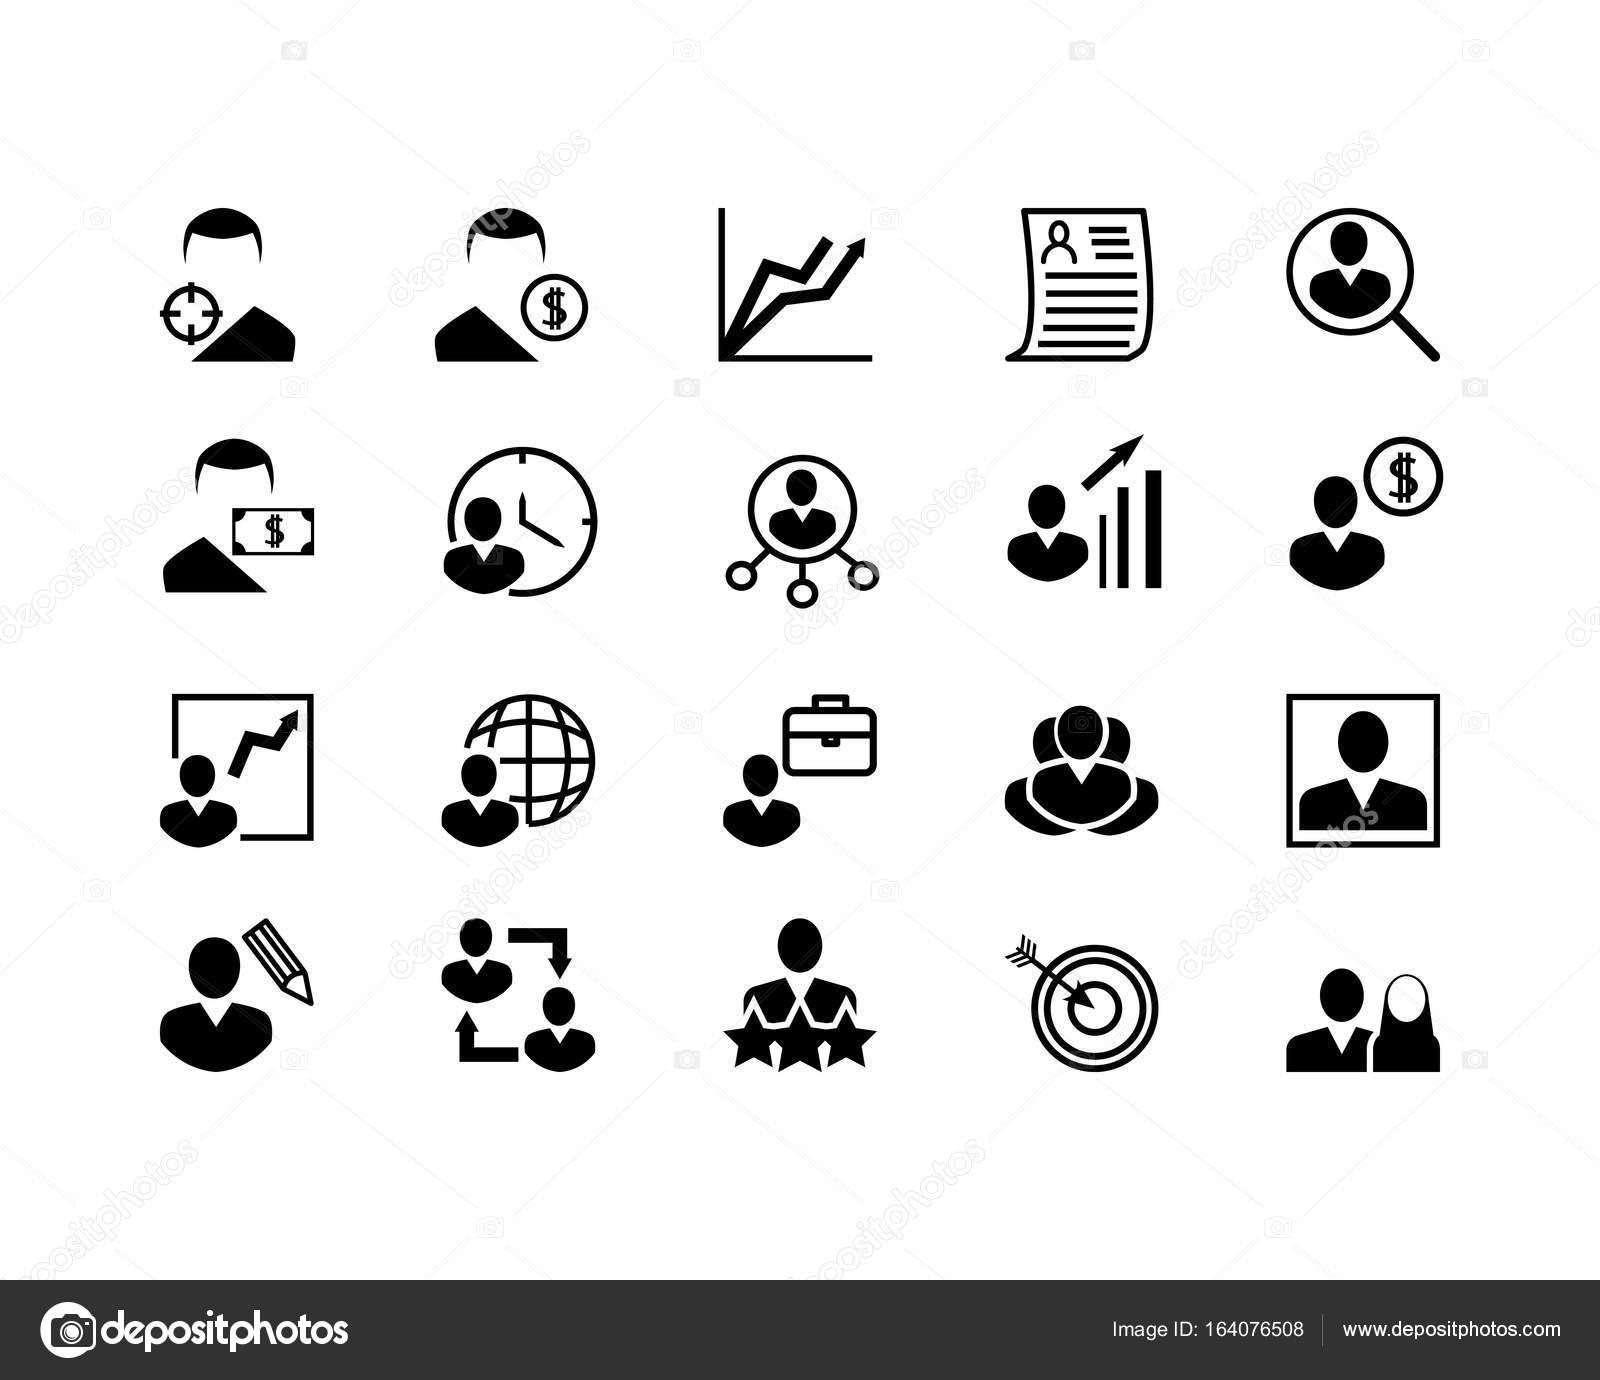 icones competences cv